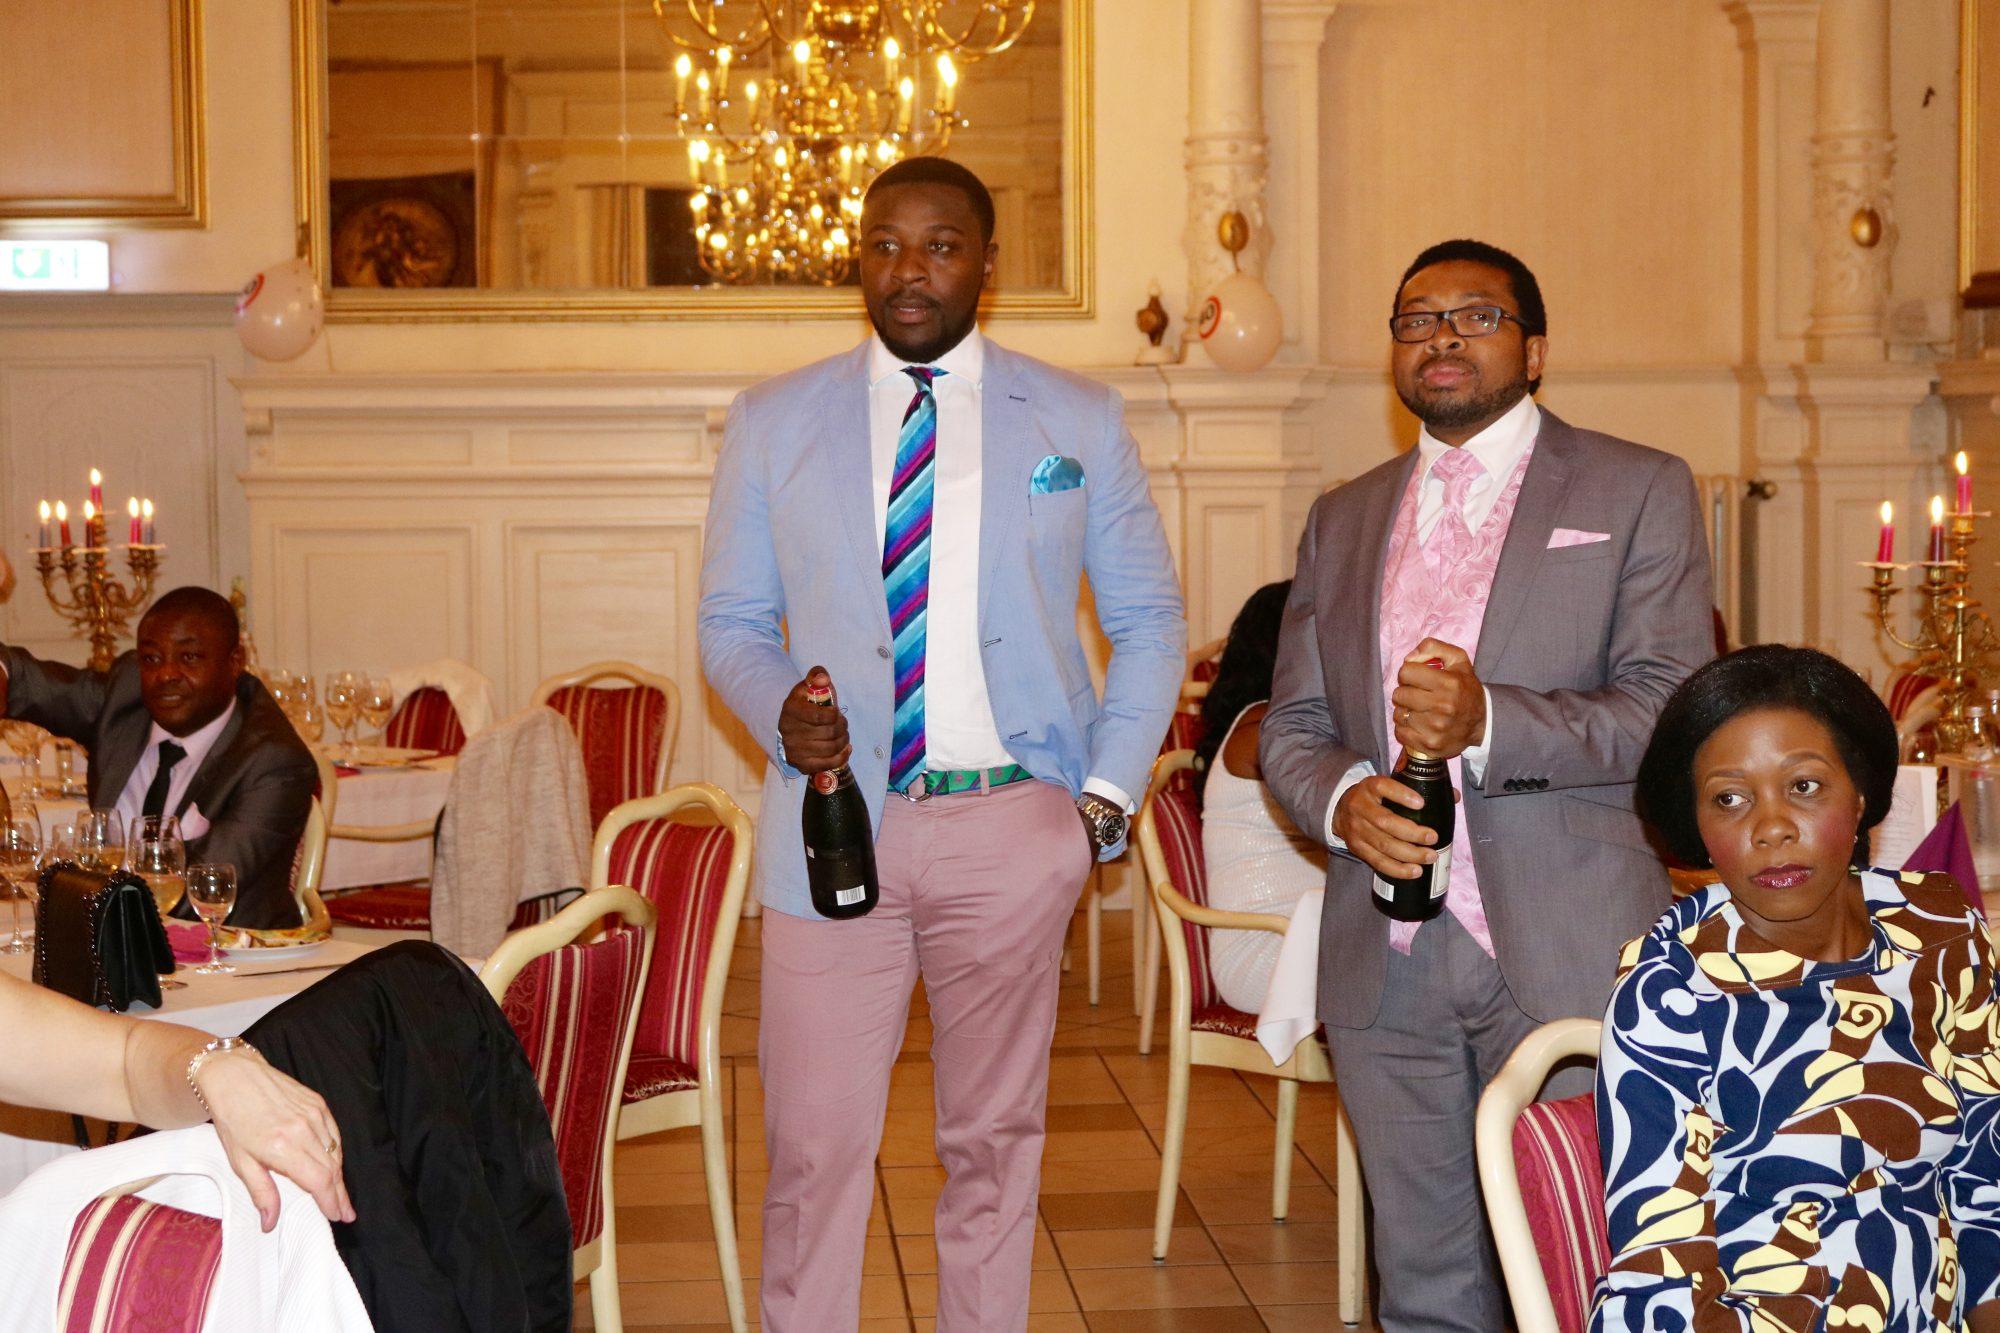 BEST DRESSED CAMEROONIAN MEN